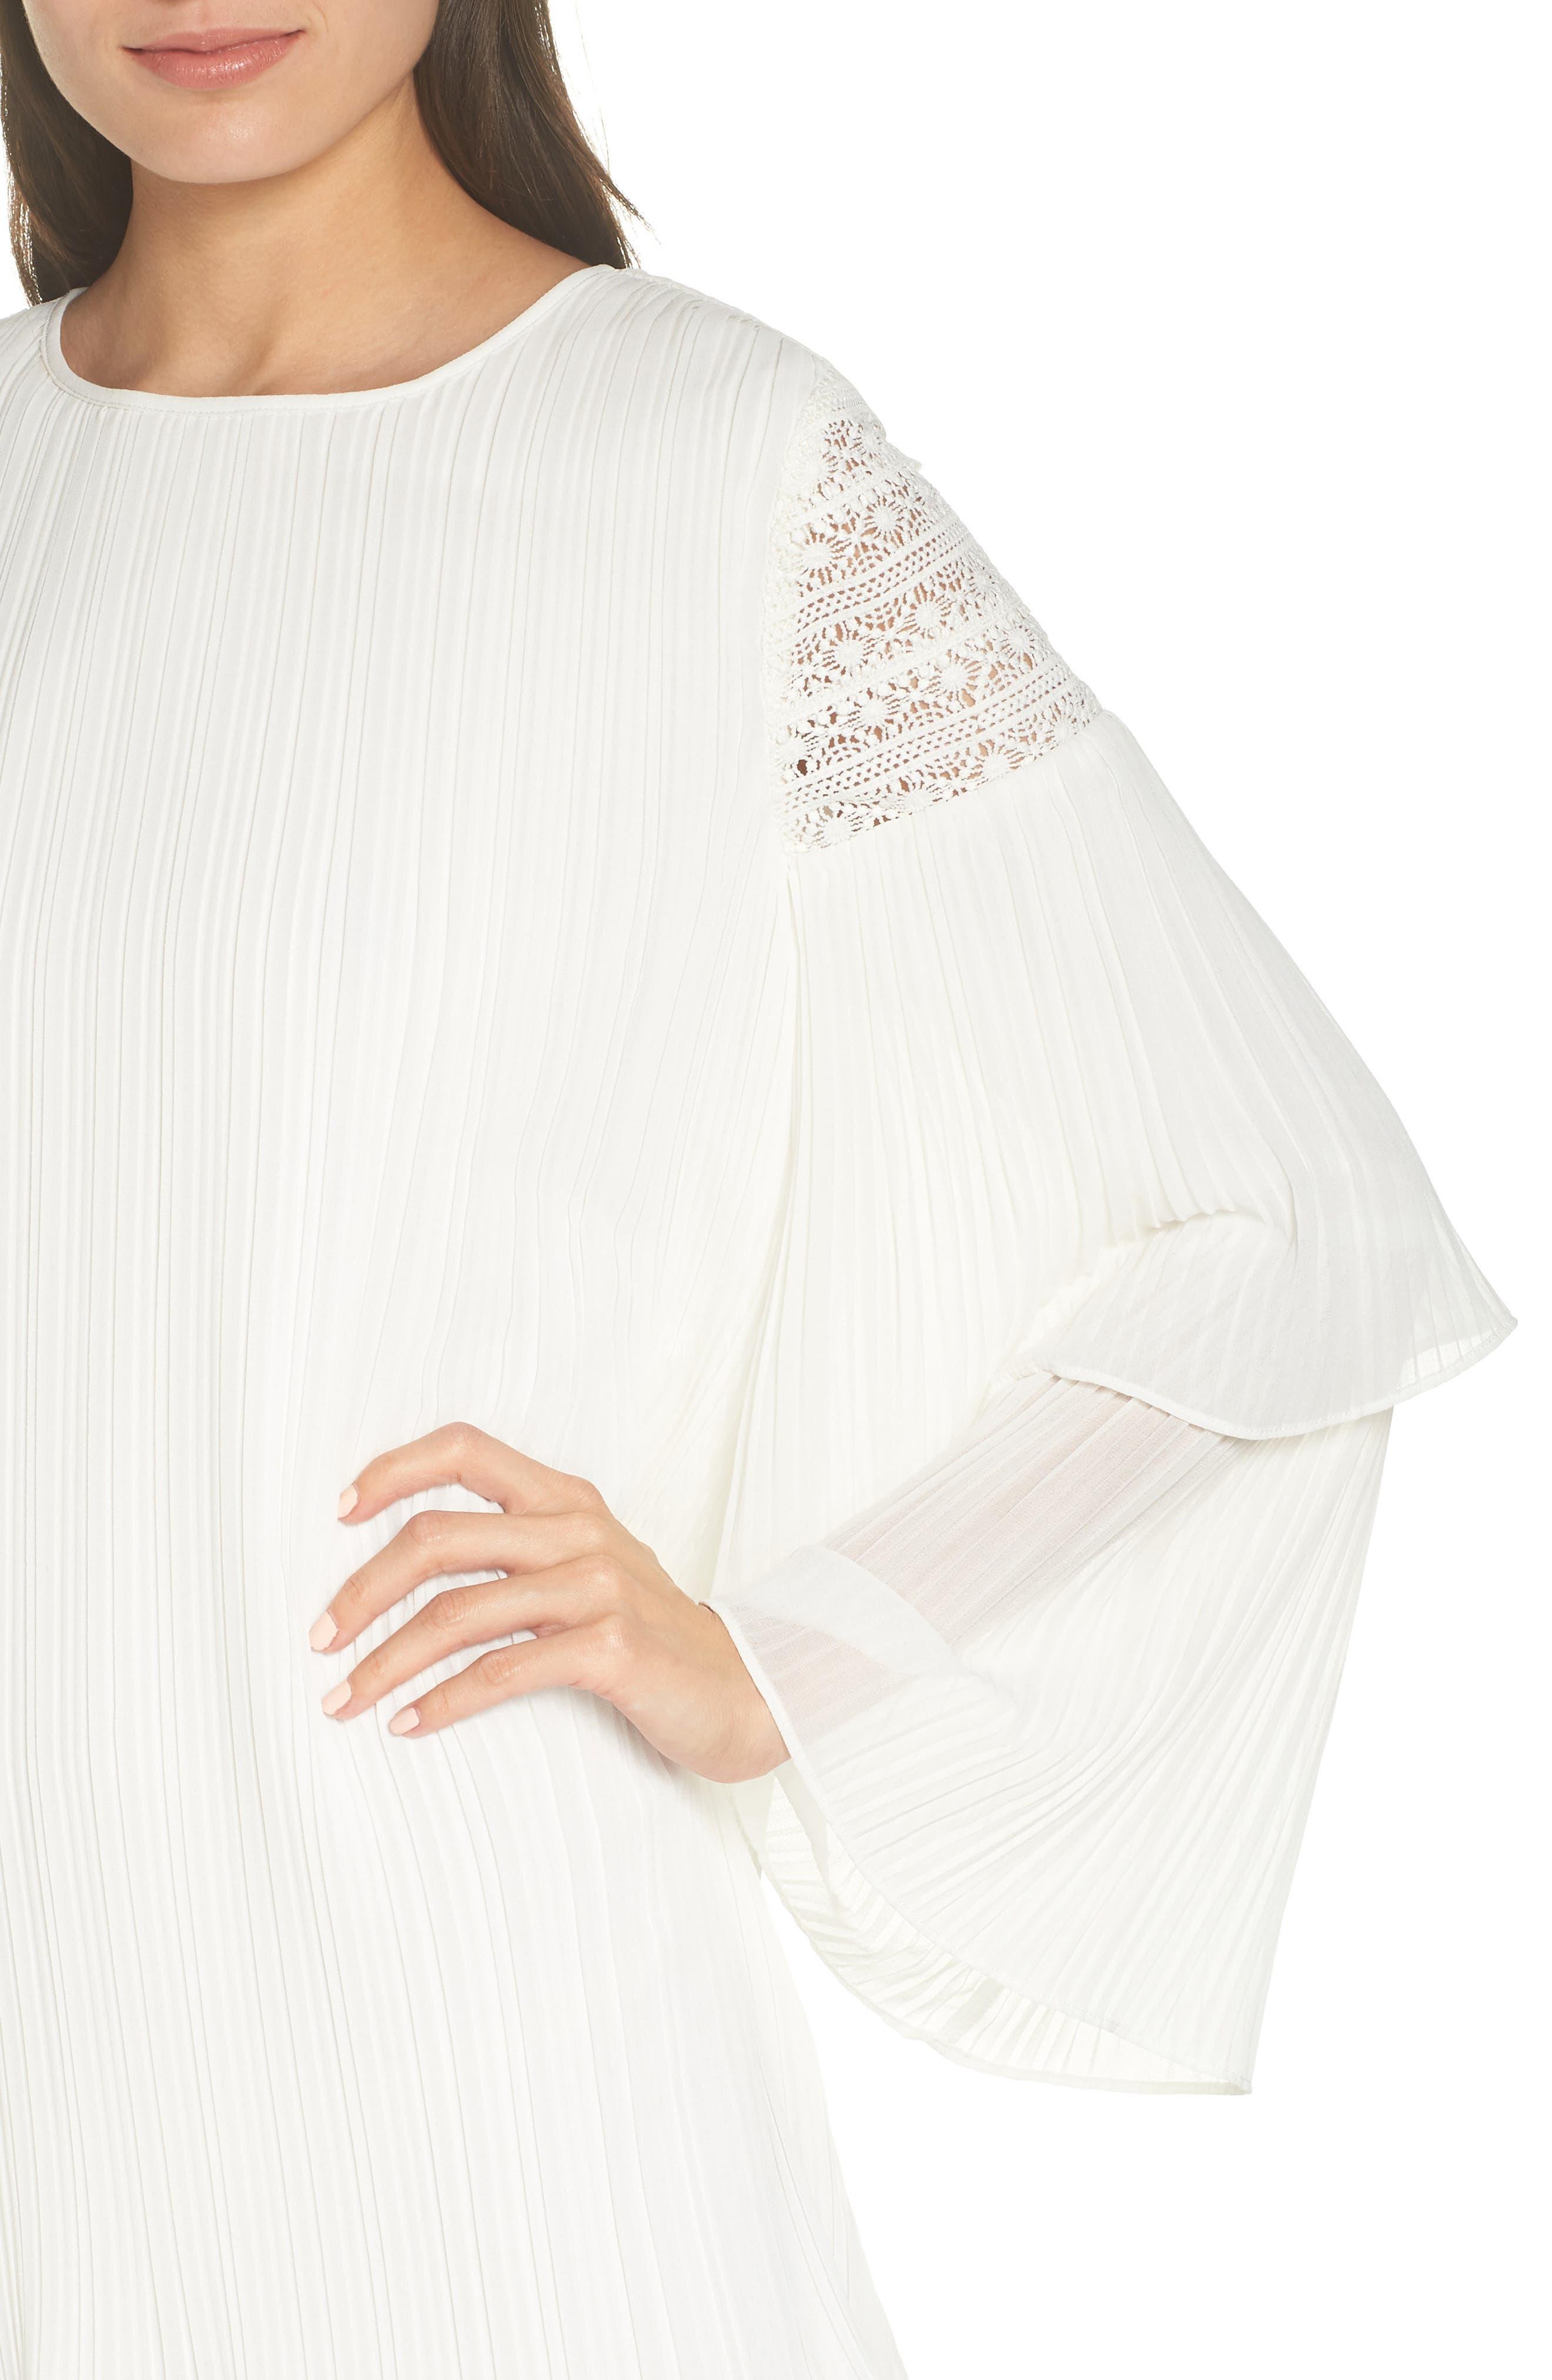 ALI & JAY, Waterlily Pleated Minidress, Alternate thumbnail 5, color, WHITE